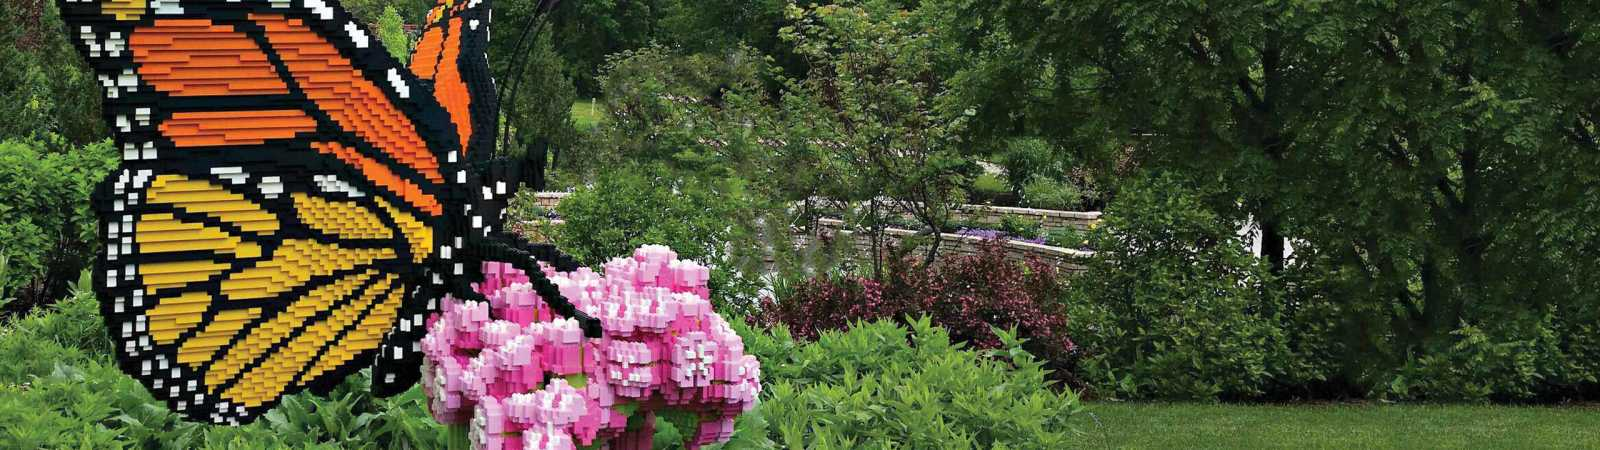 Red Butte Garden - Utah\'s Botanical Garden